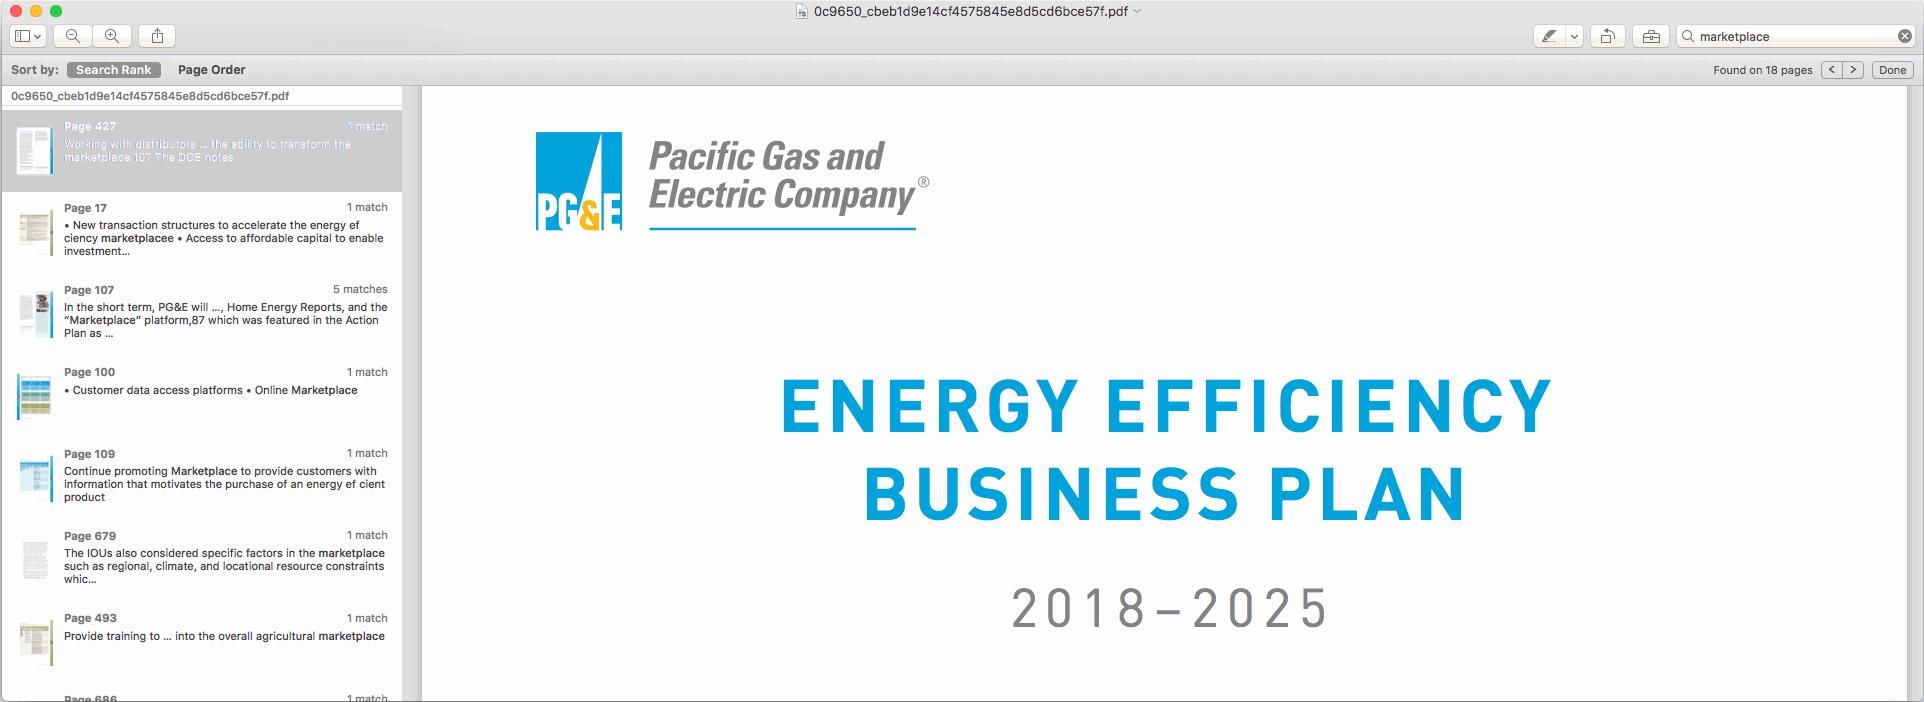 PG&E Business Plan Relies on Enervee Marketplace